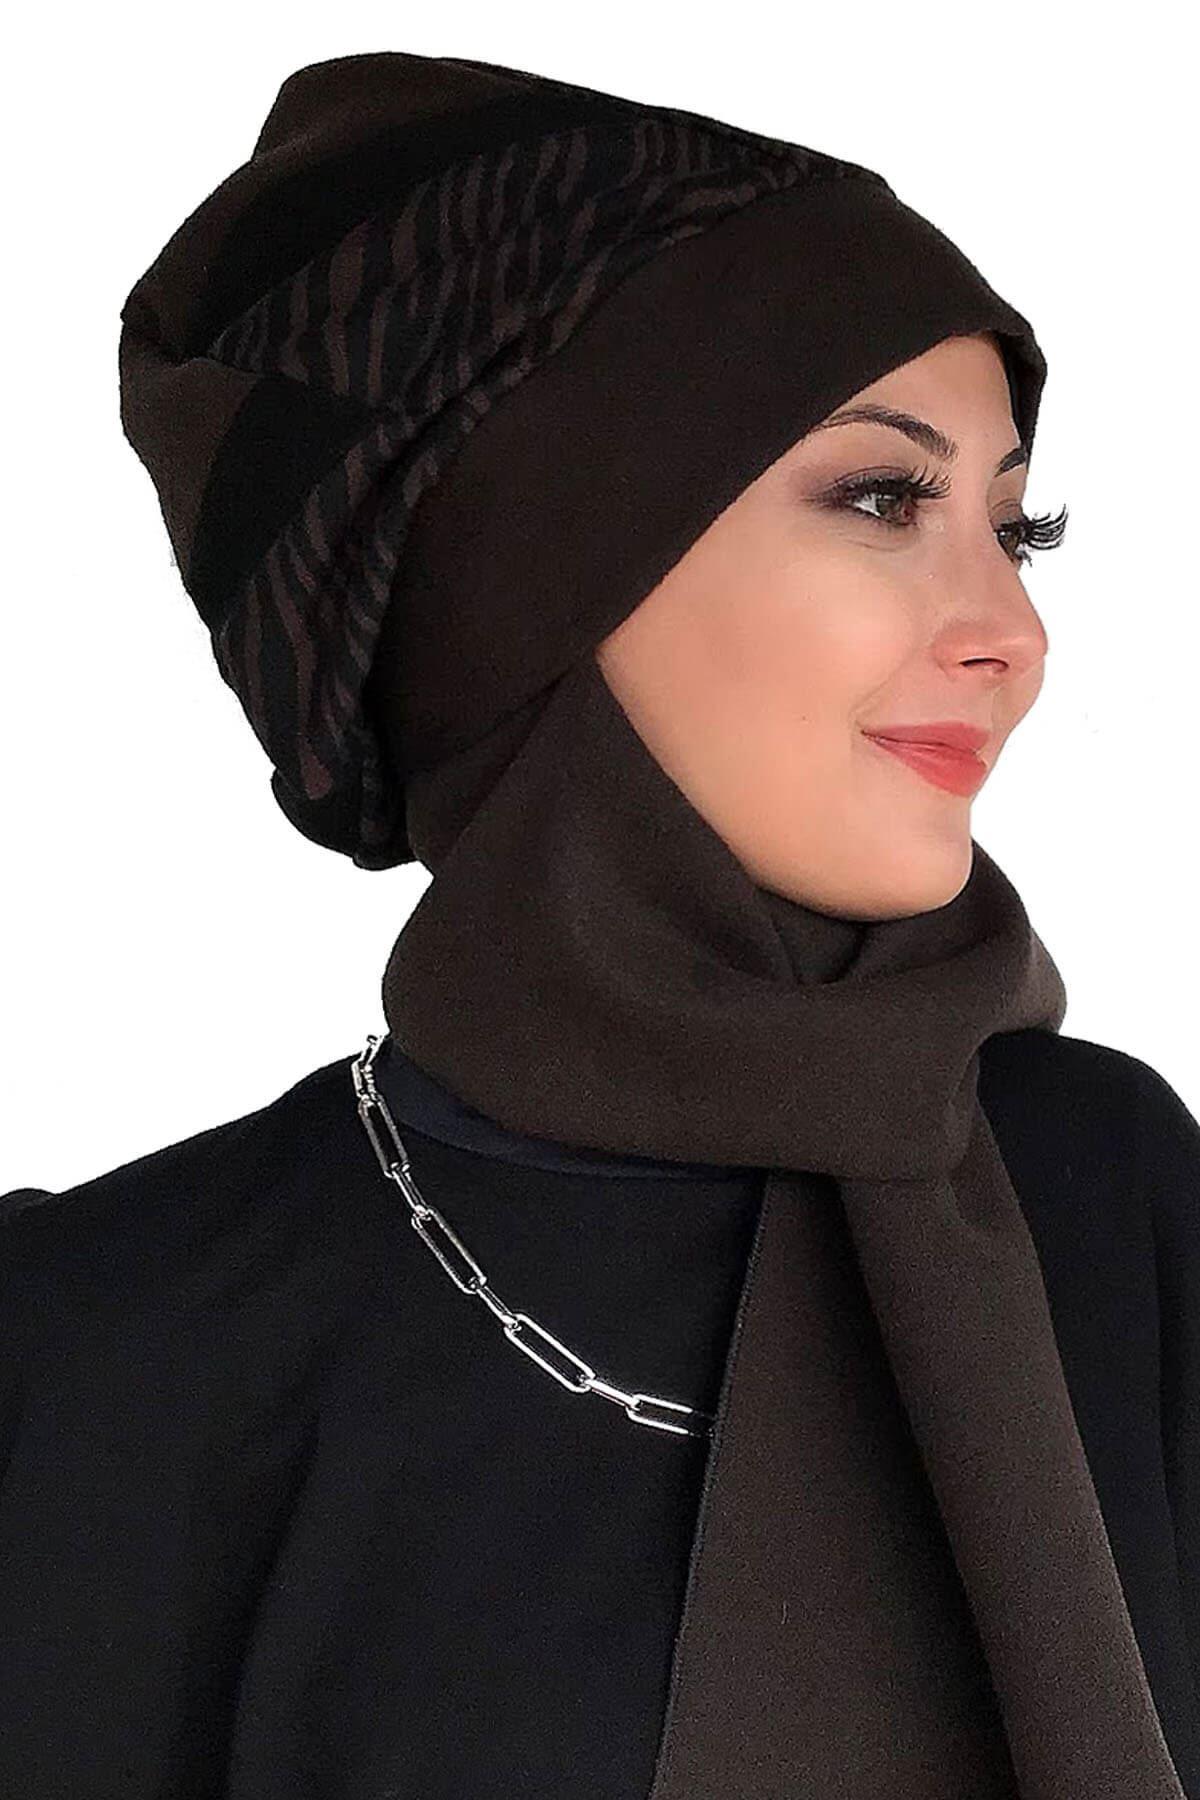 Siyah Dantelli Panço& Üç Renkli Kahverengi Kaşe Melek Model Atkılı Bere Şal